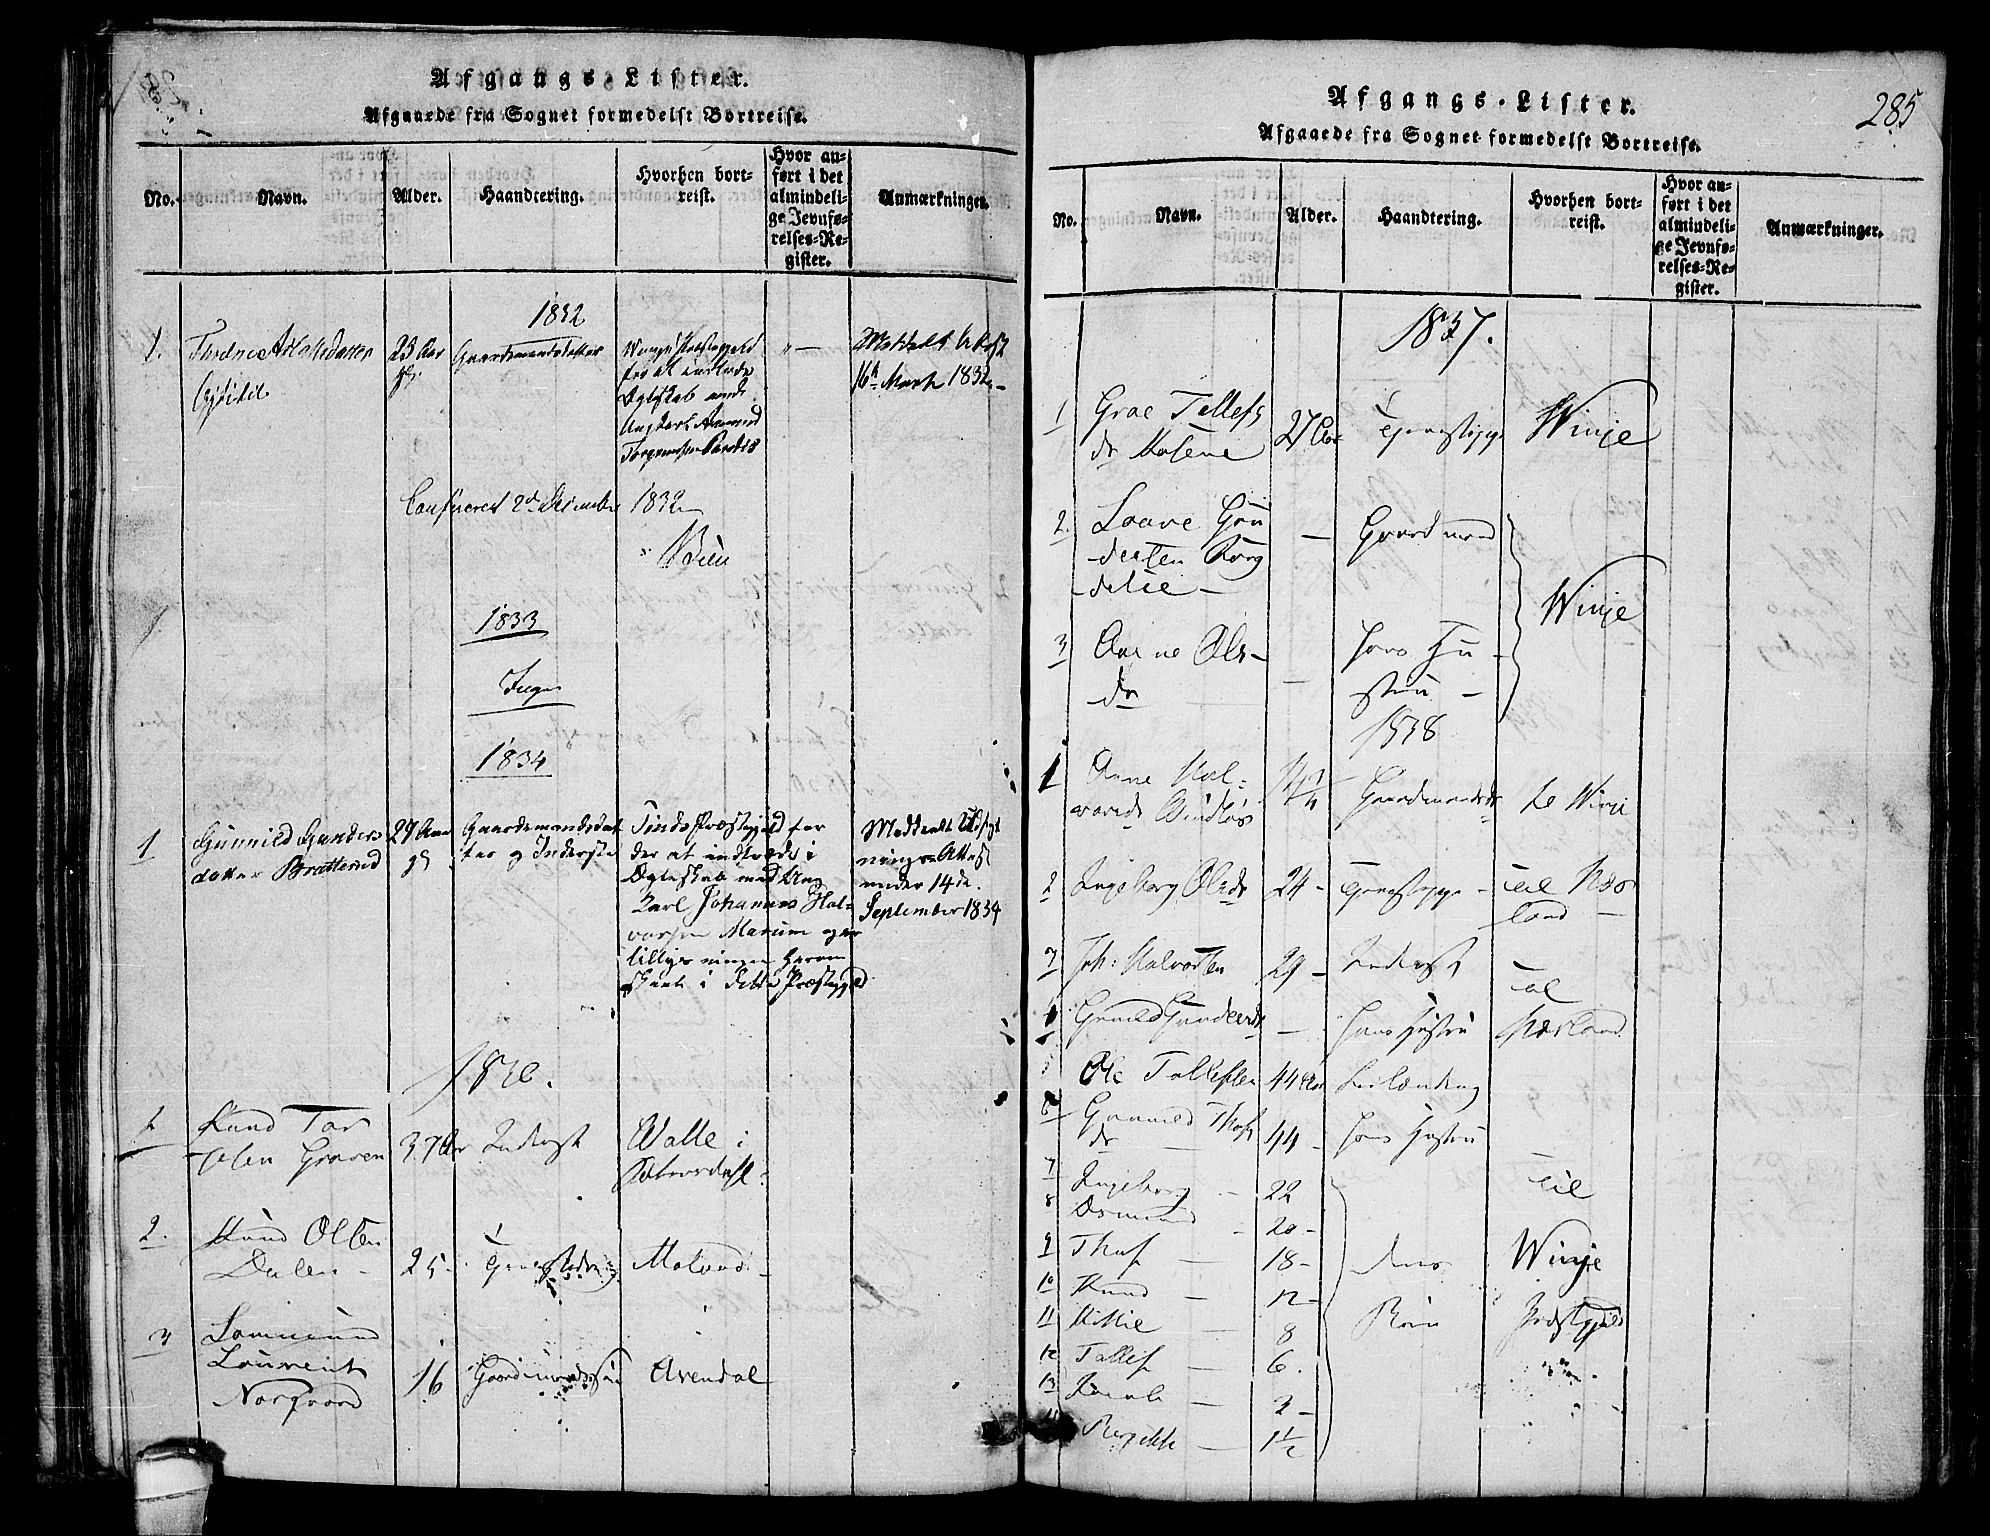 SAKO, Lårdal kirkebøker, G/Gb/L0001: Klokkerbok nr. II 1, 1815-1865, s. 285